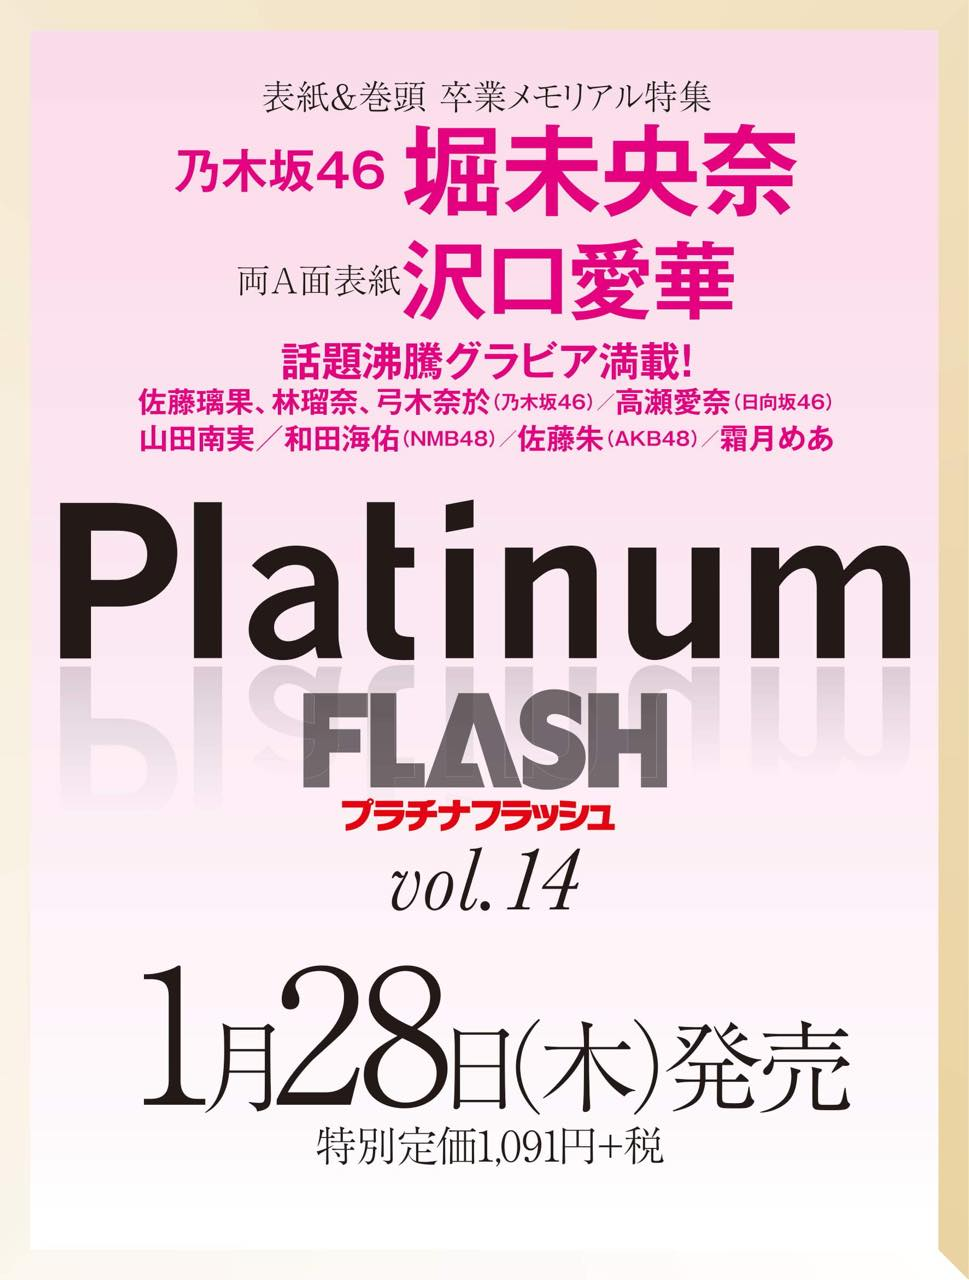 AKB48 佐藤朱、NMB48 和田海佑、グラビア掲載!「Platinum FLASH vol.14」1/28発売!